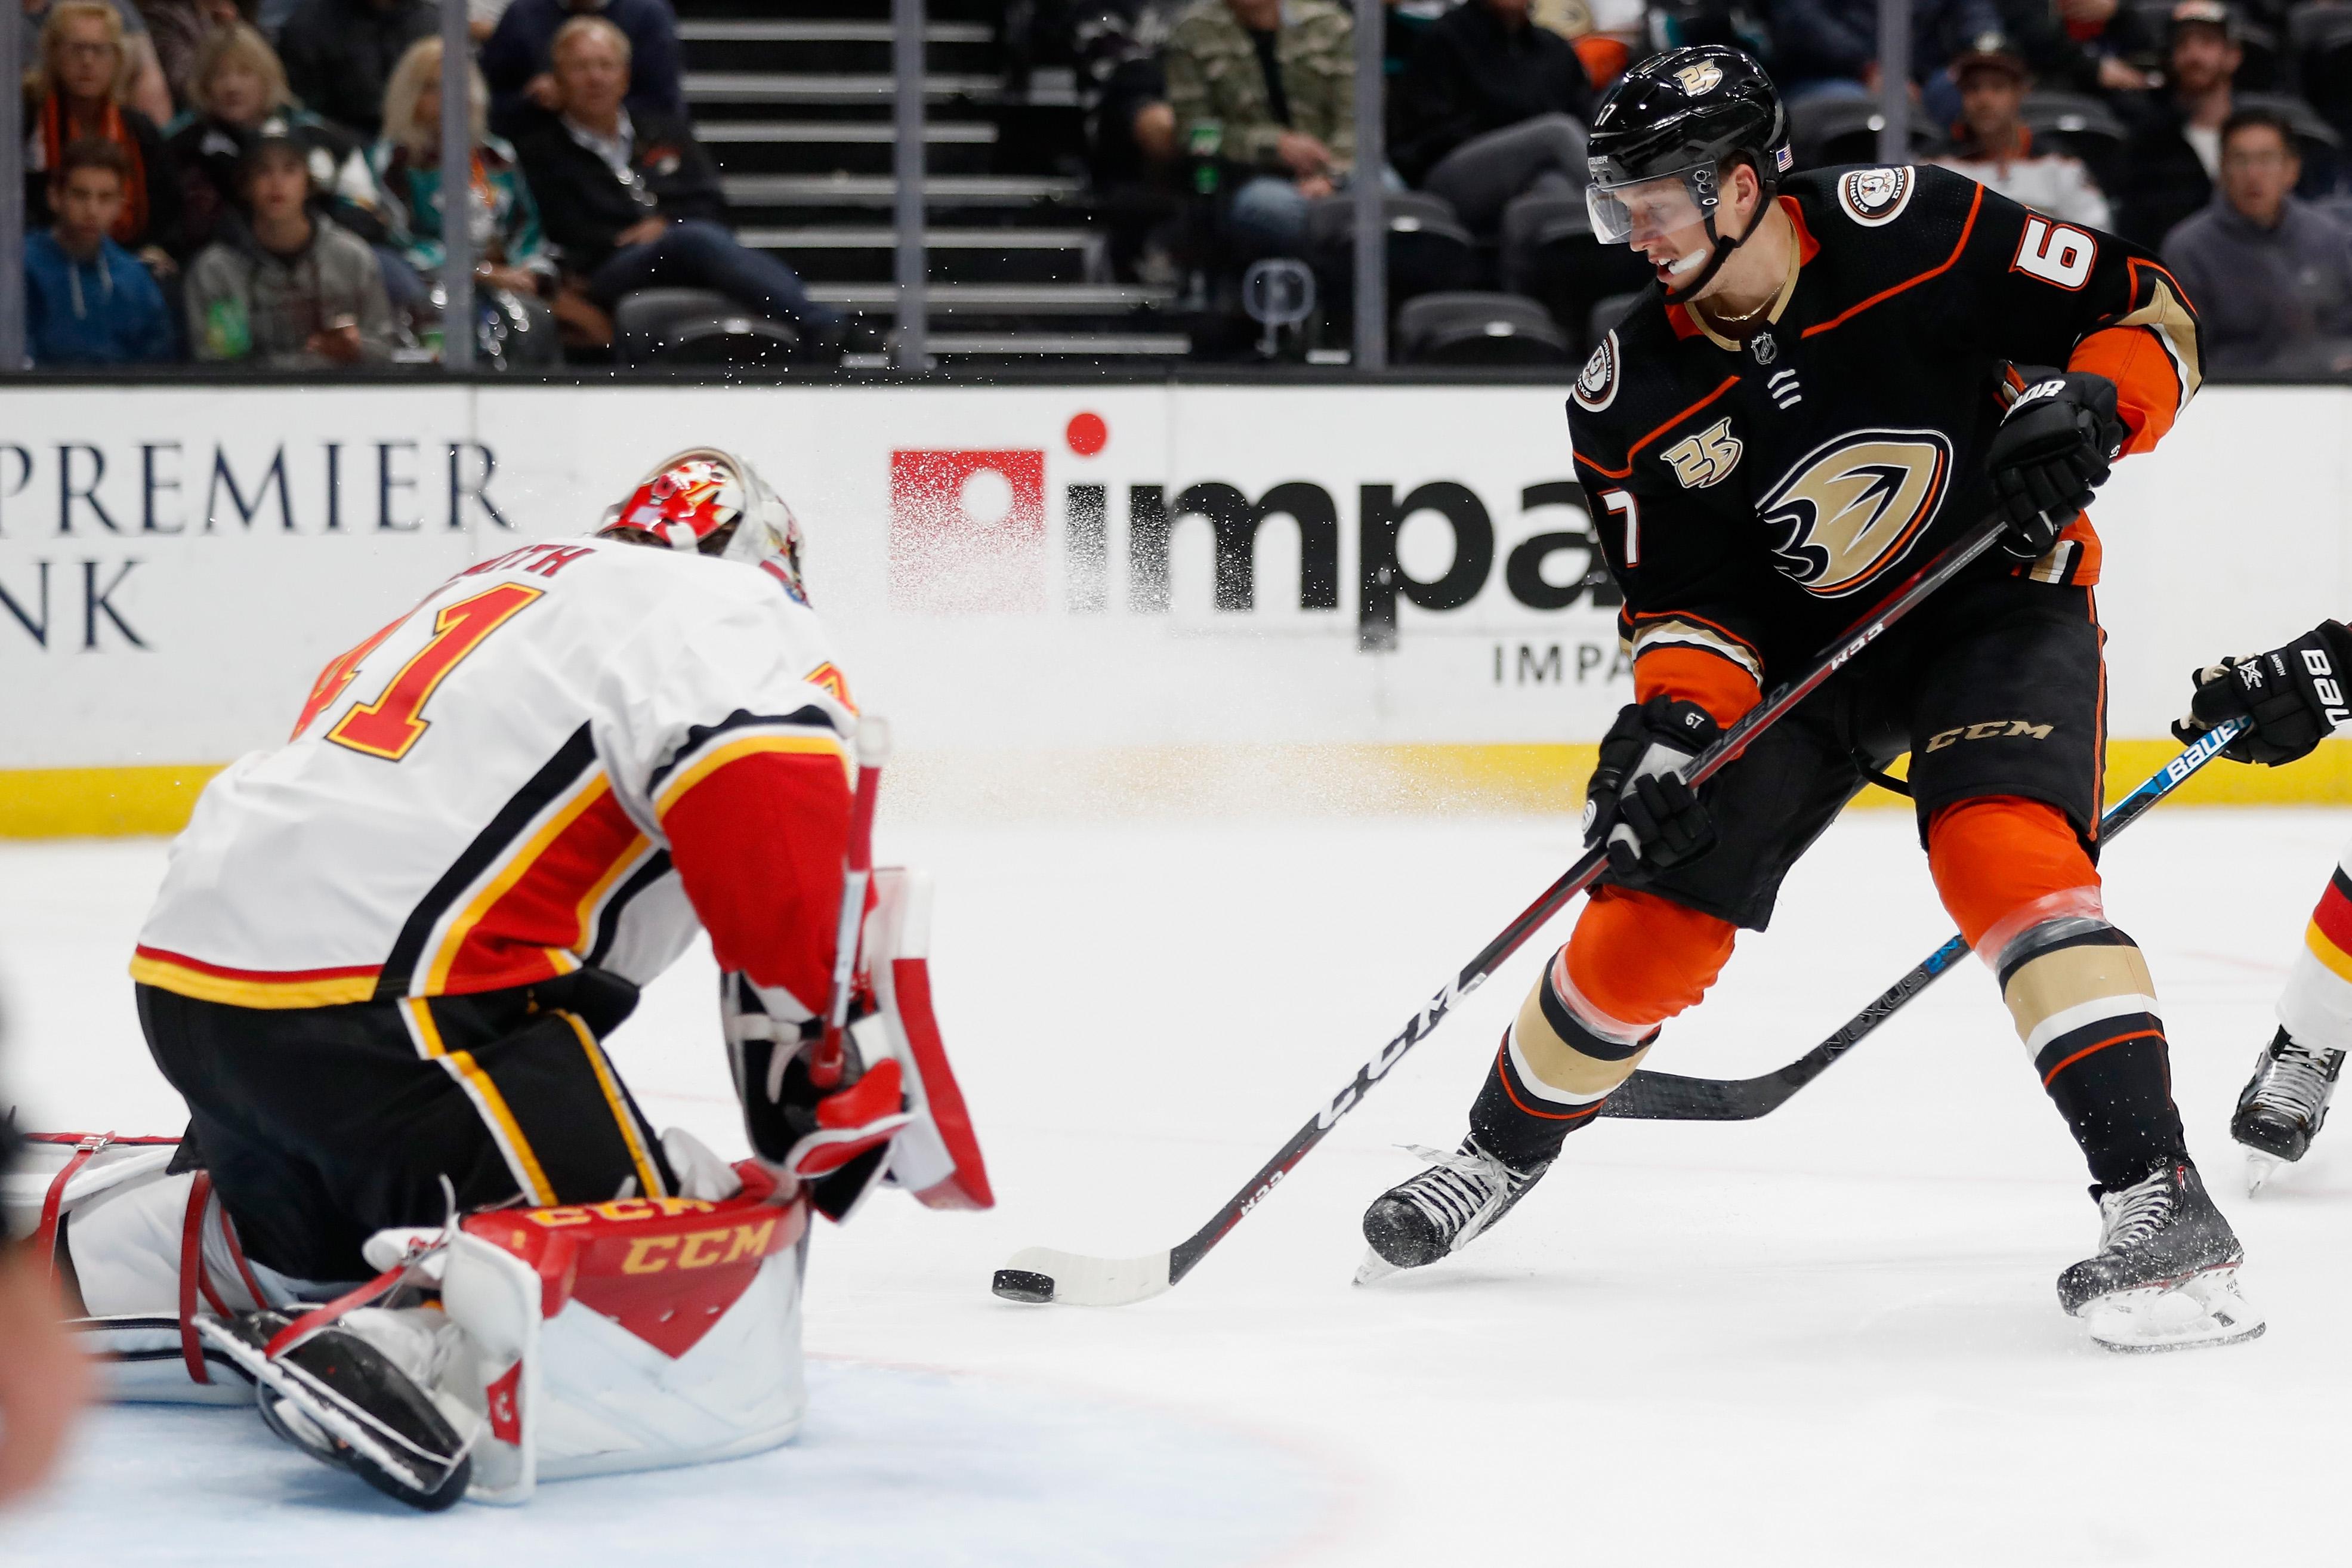 Calgary Flames v Anaheim Ducks